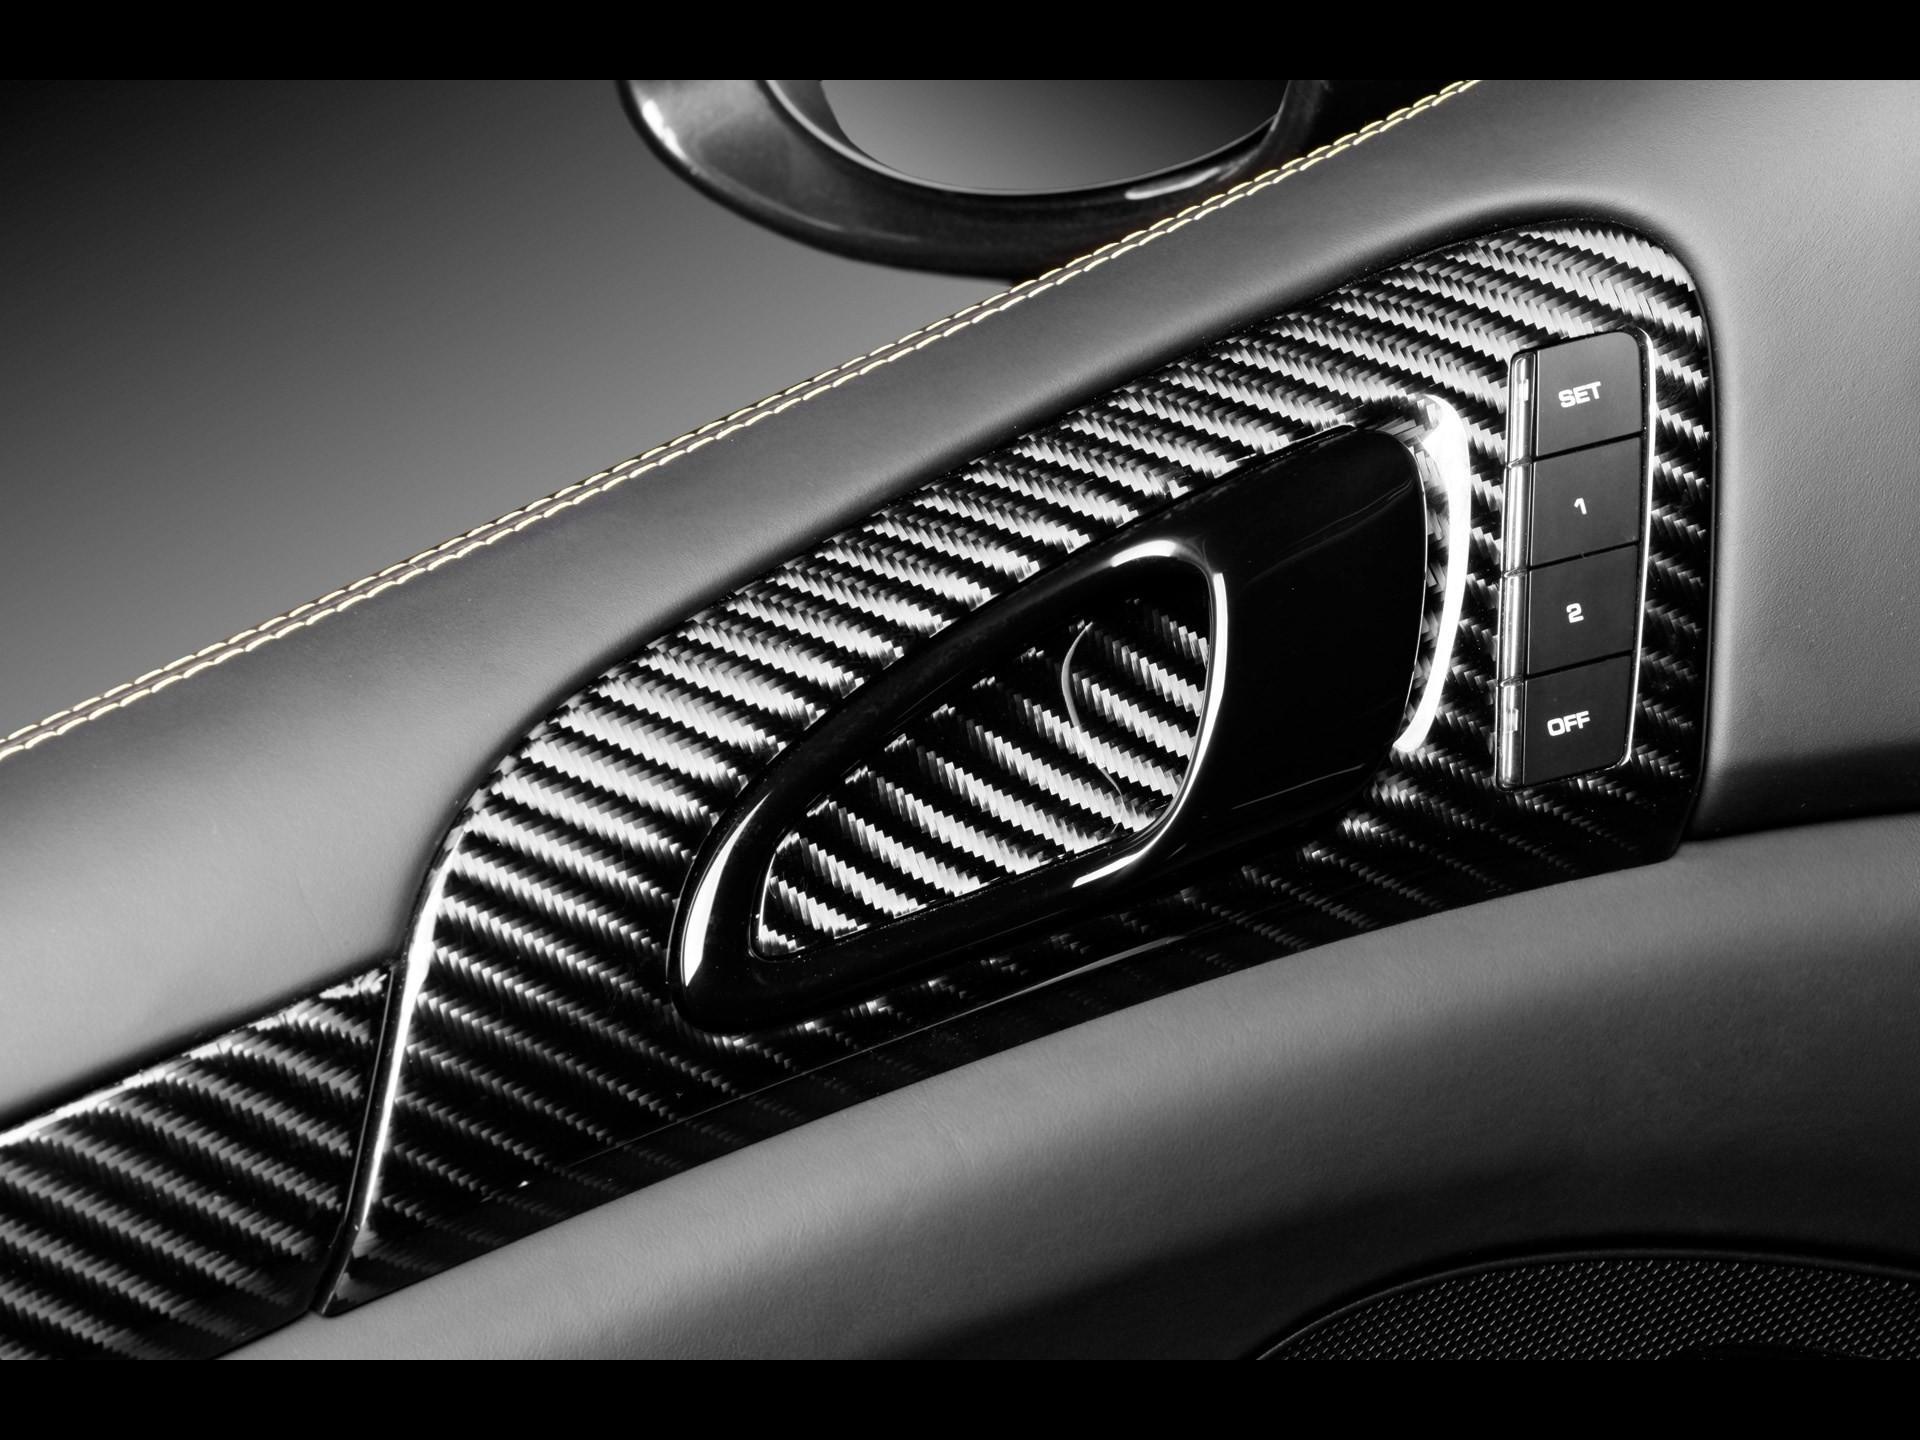 carbon fiber wallpaper for mac computers | 2048×1087 | 849 kB by .